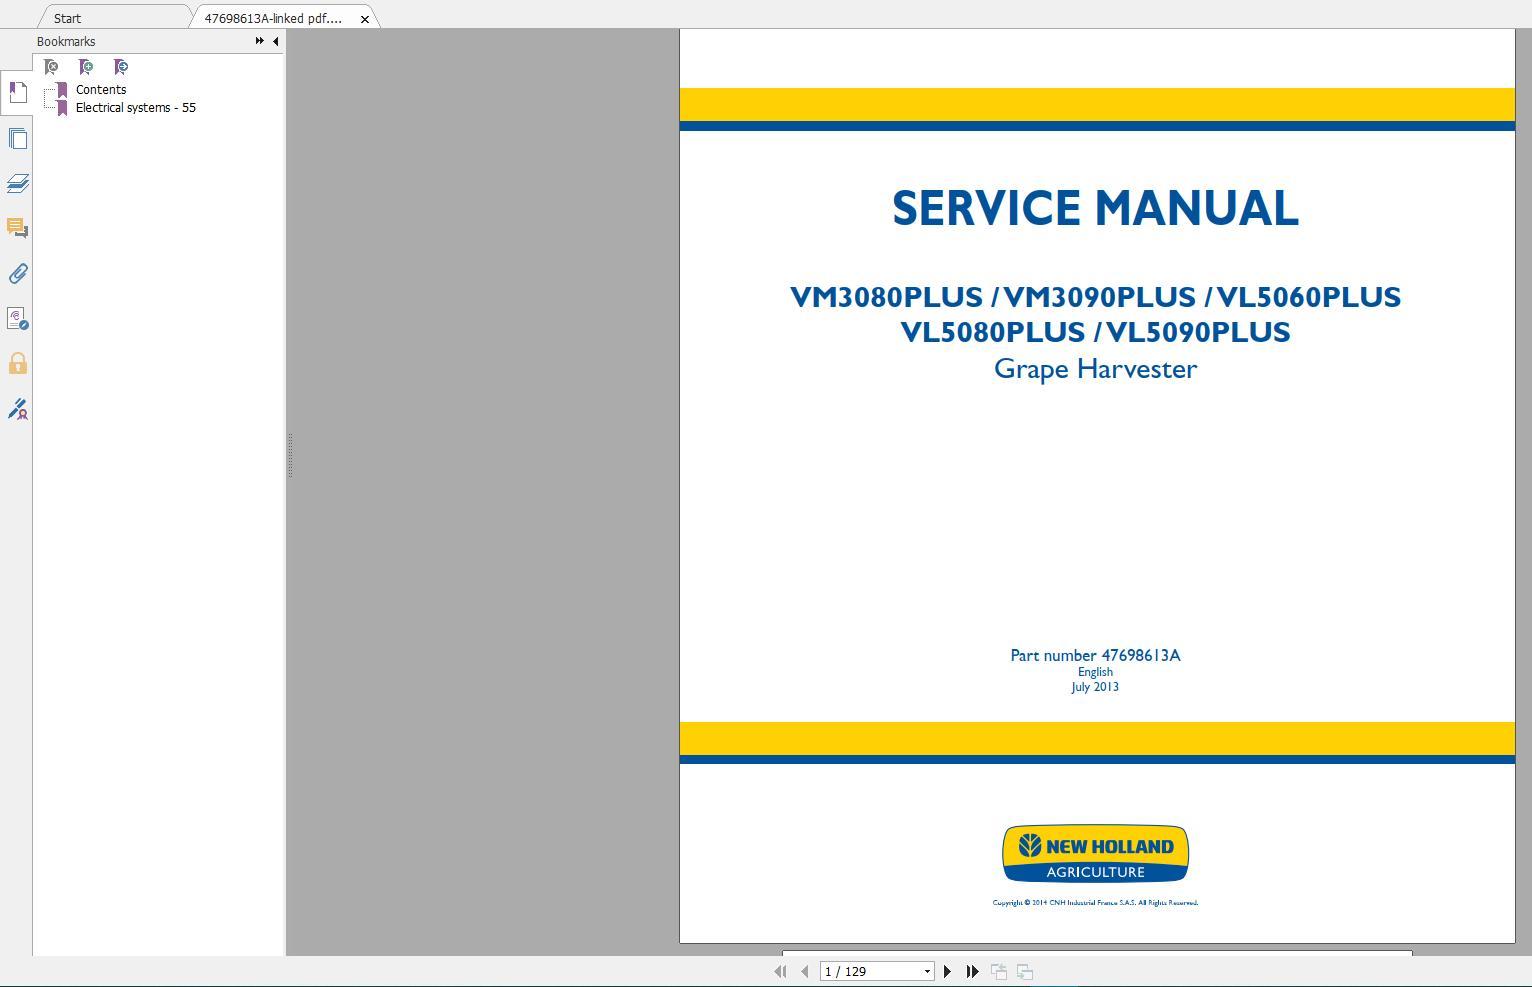 New_Holland_New_Model_Service_Manual_112018_Full_DVD7-1